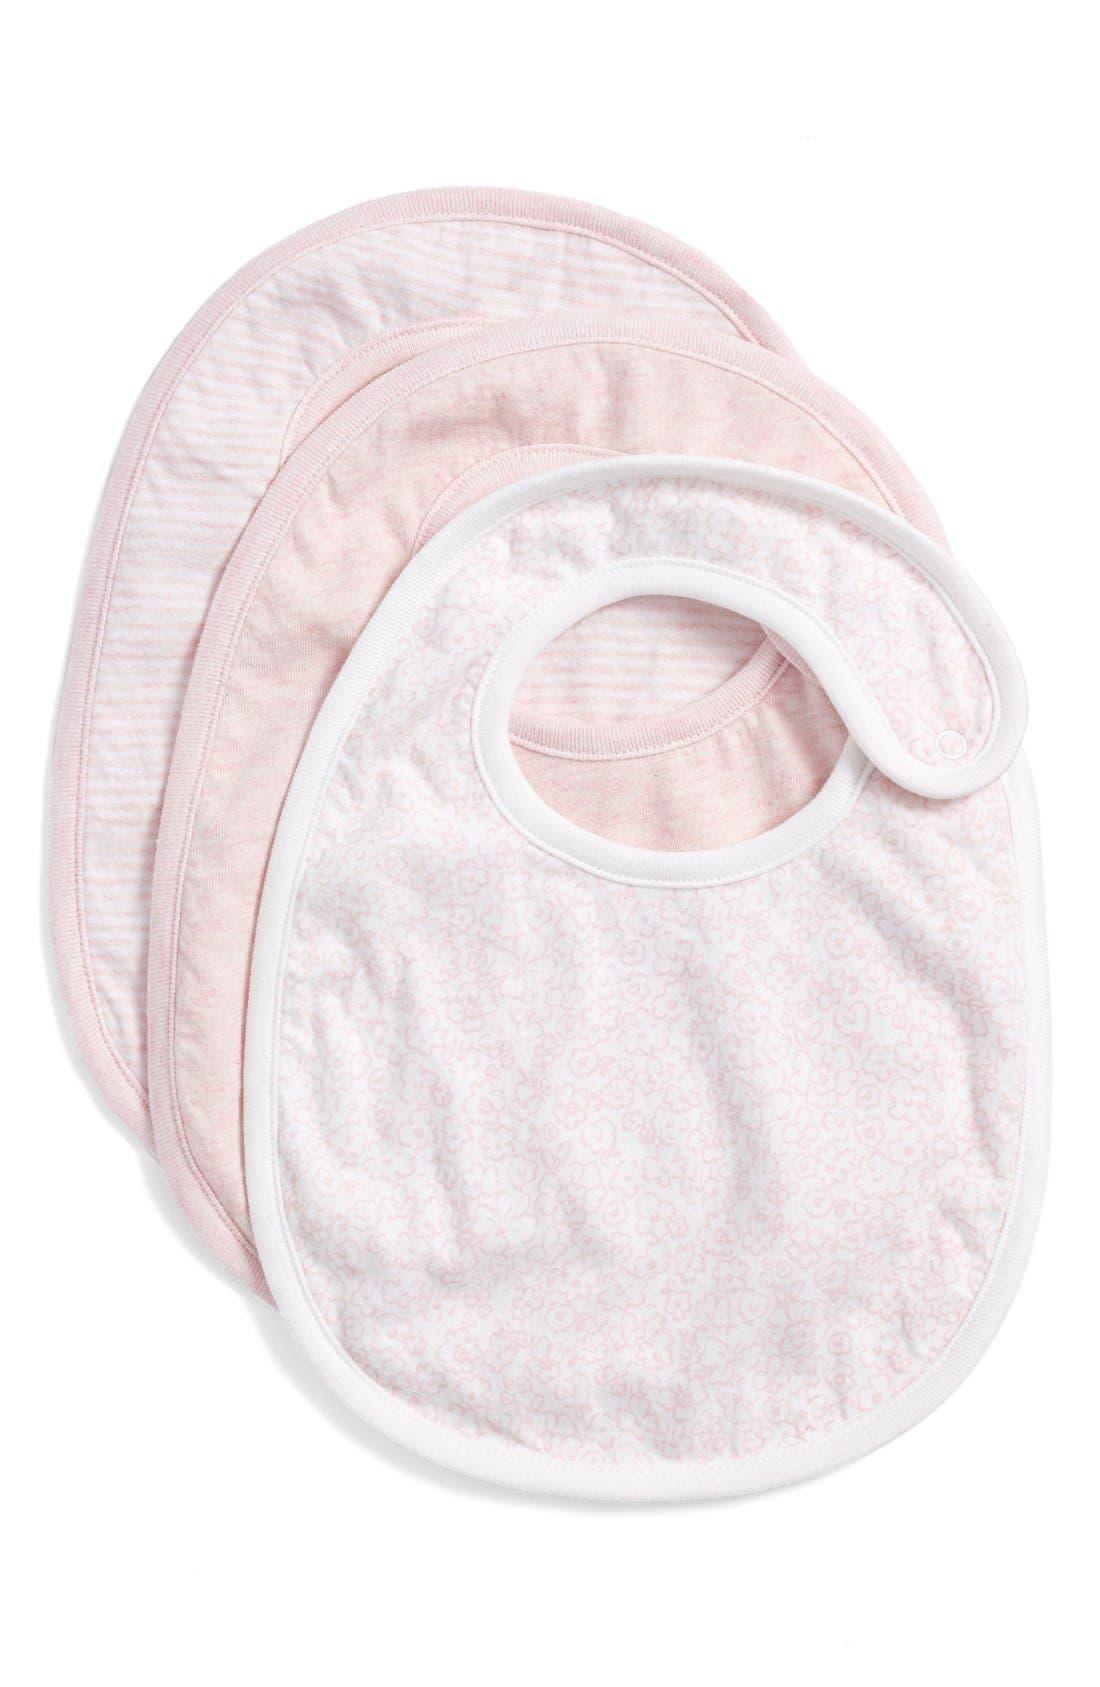 Nordstrom Baby Bibs (3-Pack)